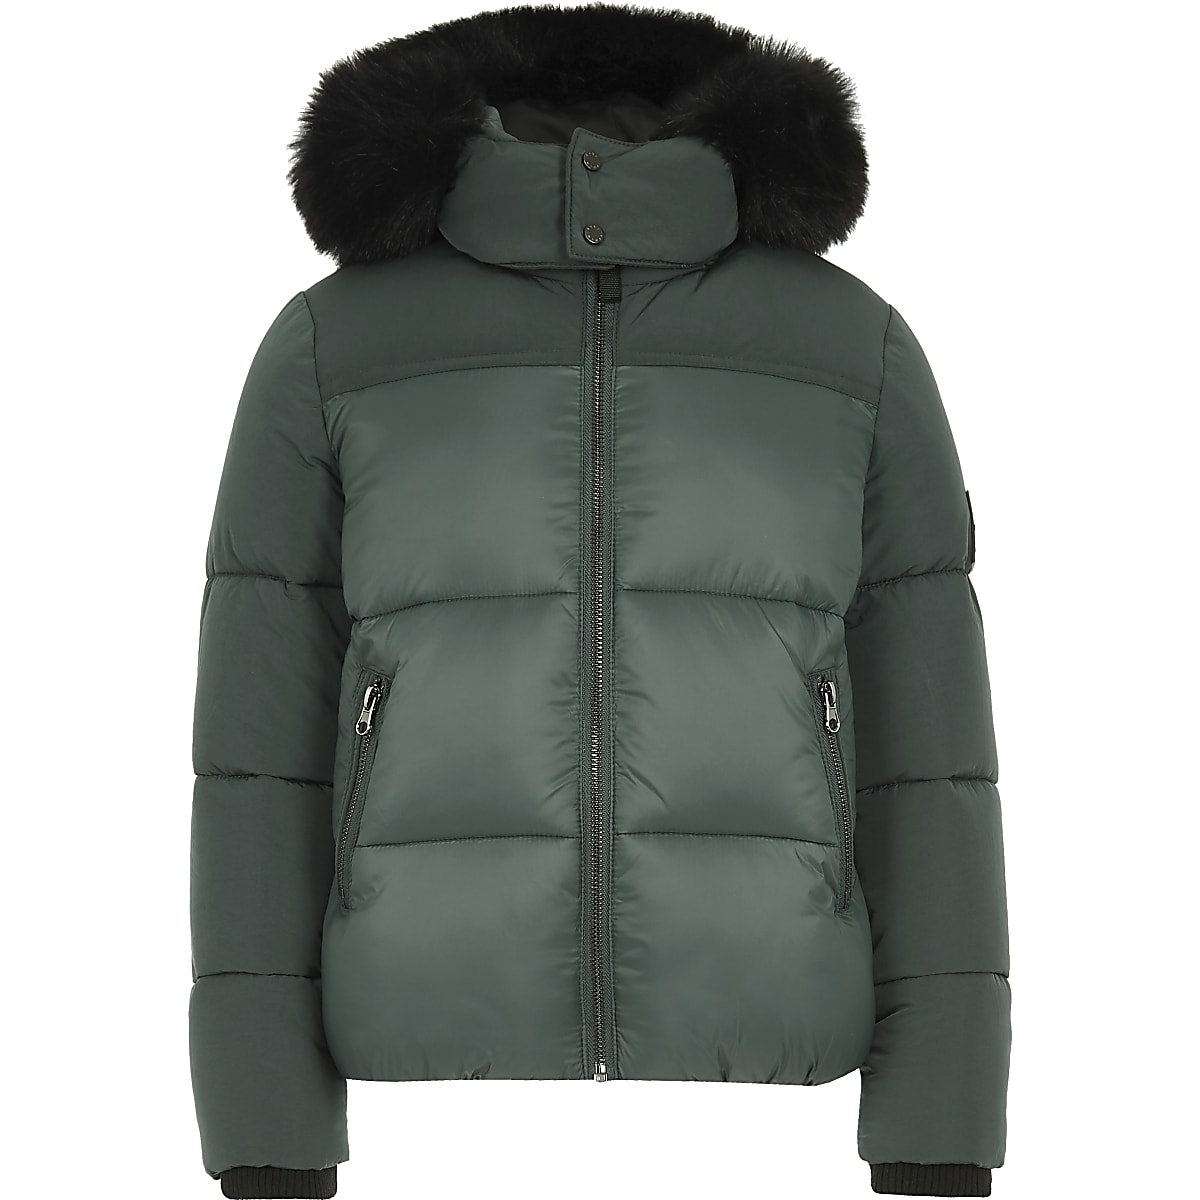 9ae7d5a0e44 Boys green faux fur hood puffer coat - Coats - Coats & Jackets - boys